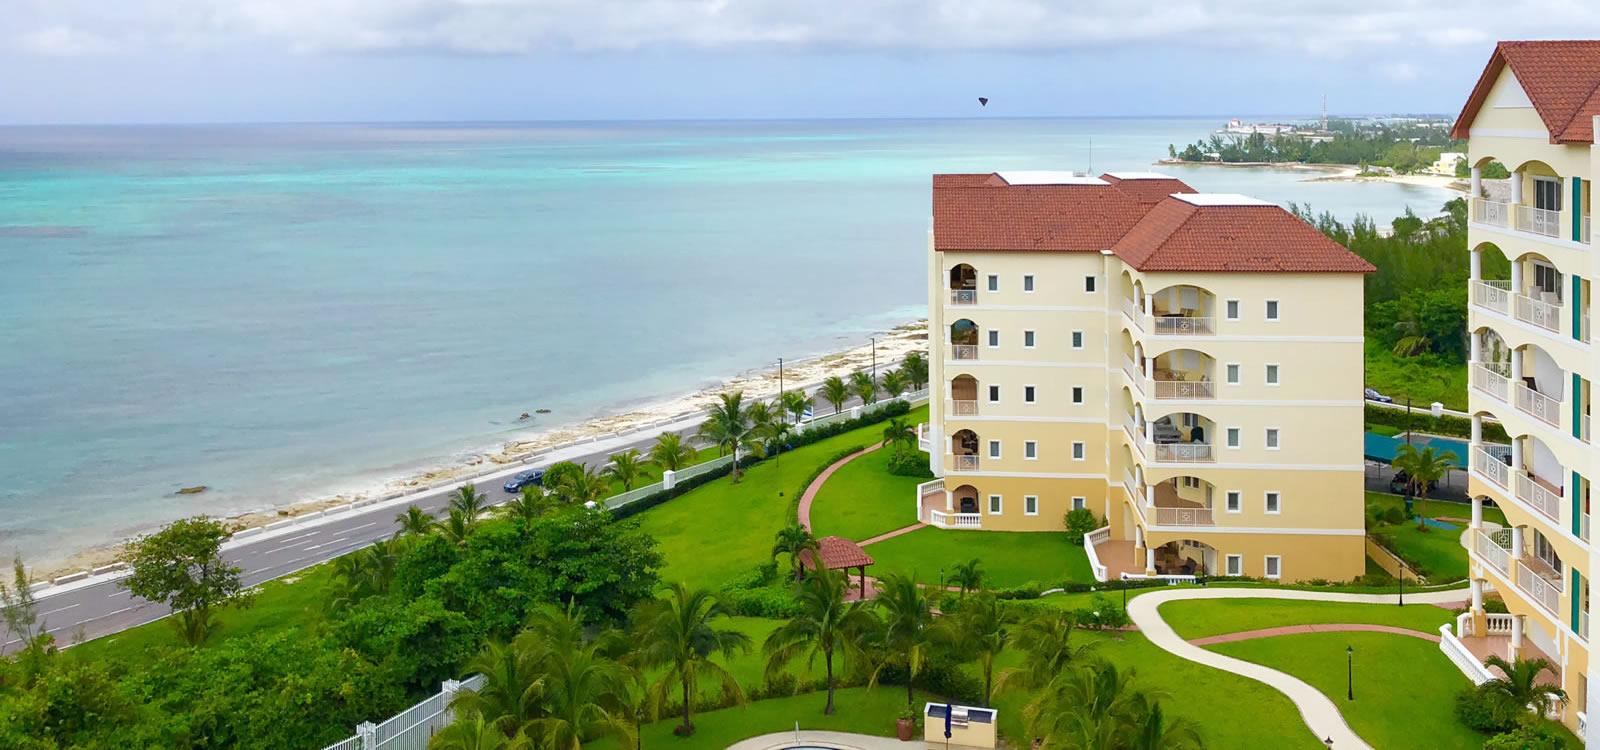 Condo For Sale Grand Bahama Island